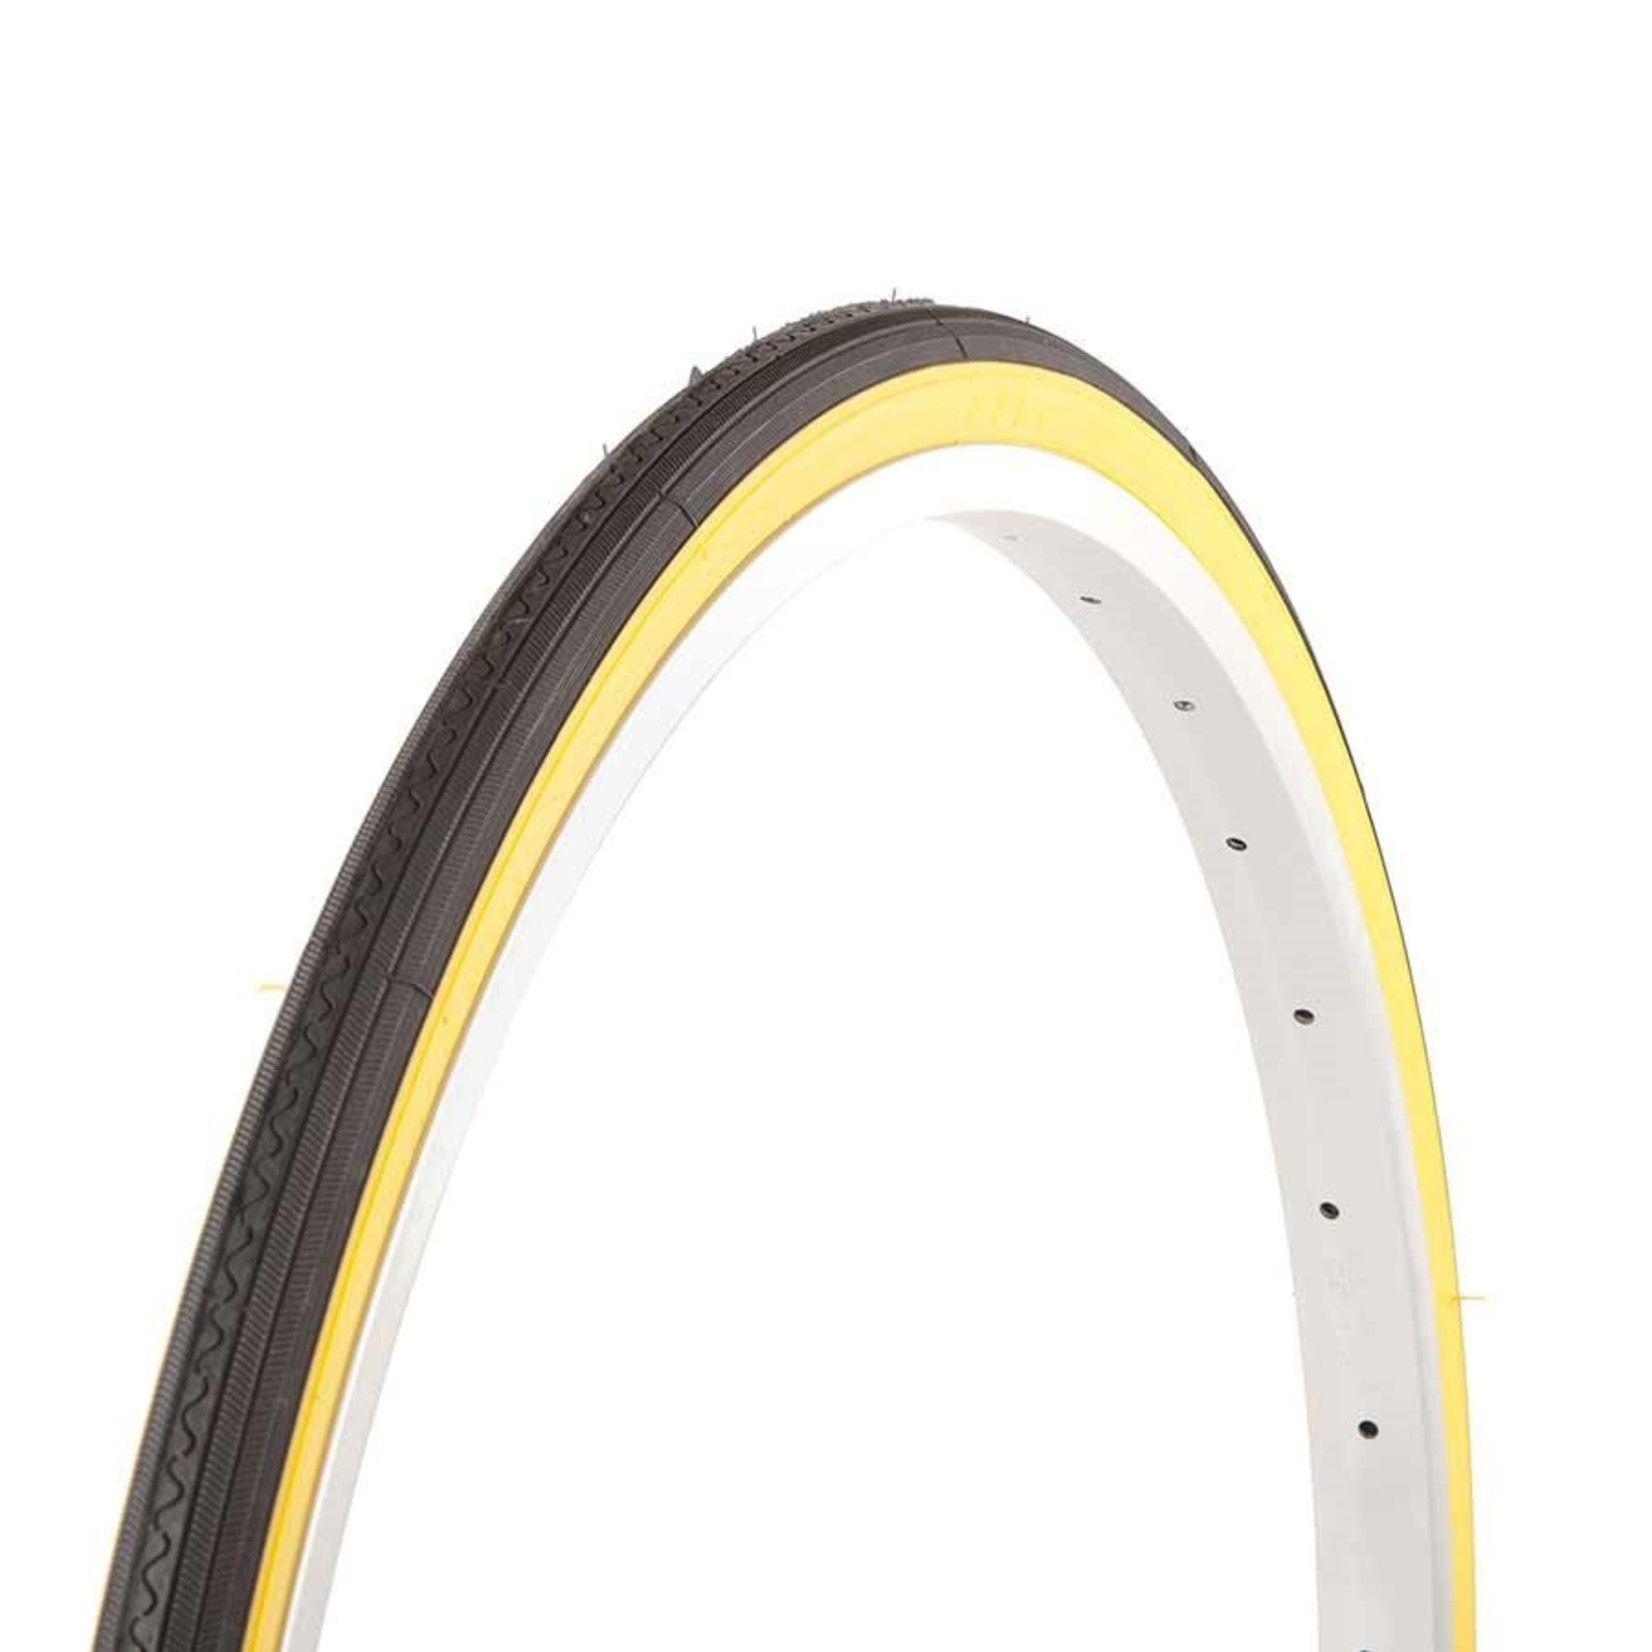 "Evo Evo Dash 27x1-1/4"" Wire Bead Road Tire Tan Sidewall"